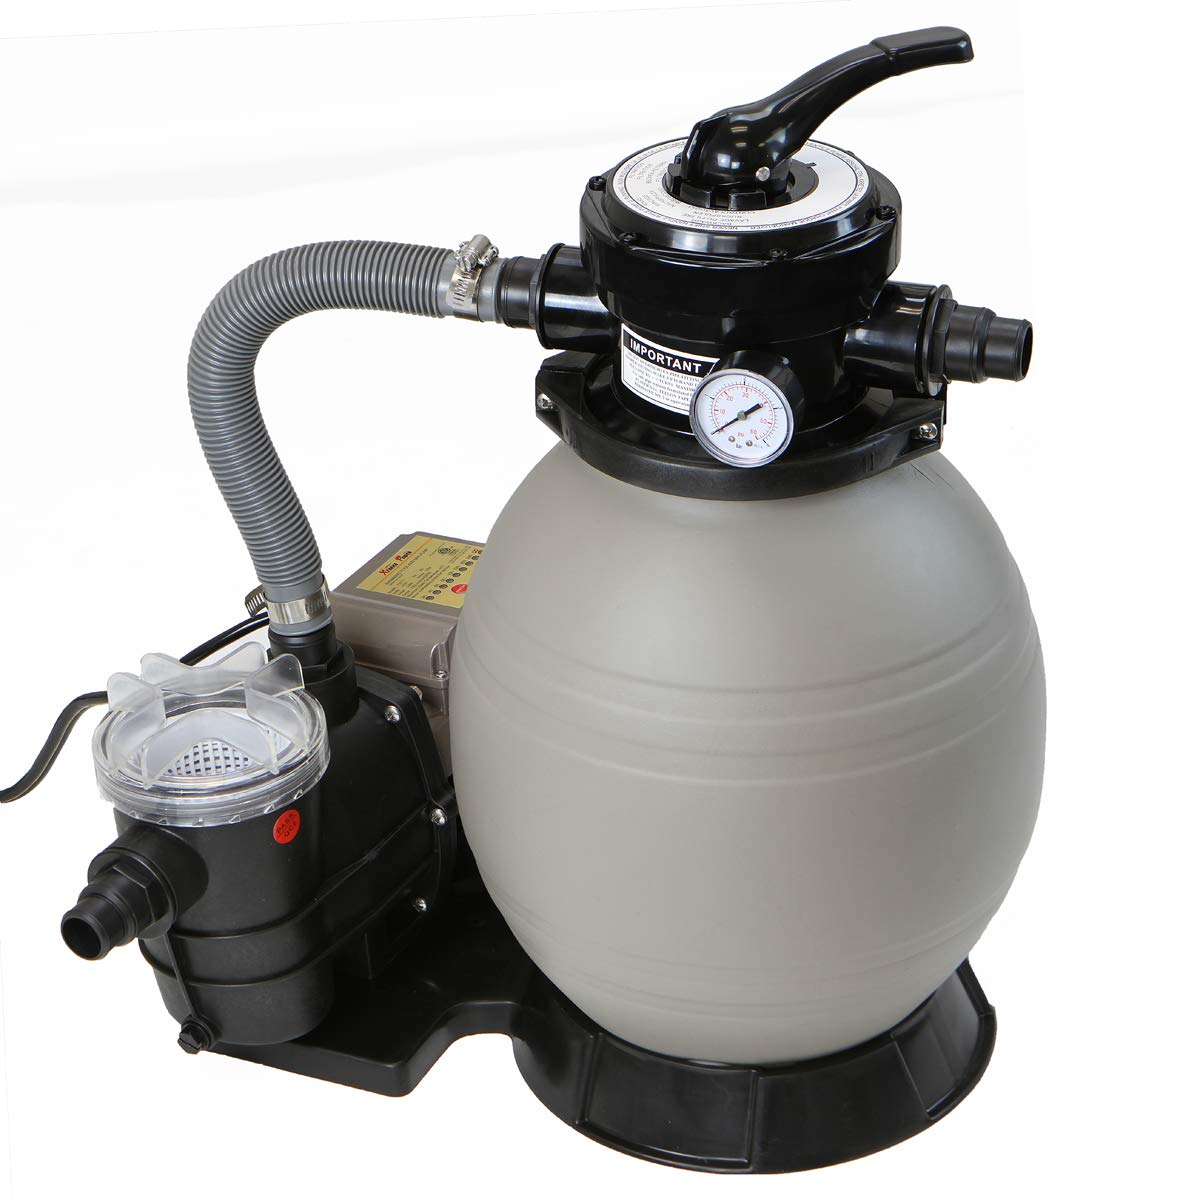 "XtremepowerUS 2640GPH 13"" Sand Filter w/ 3/4HP Digital Programmer Timer Above Ground Swimming Pool Pump Set"